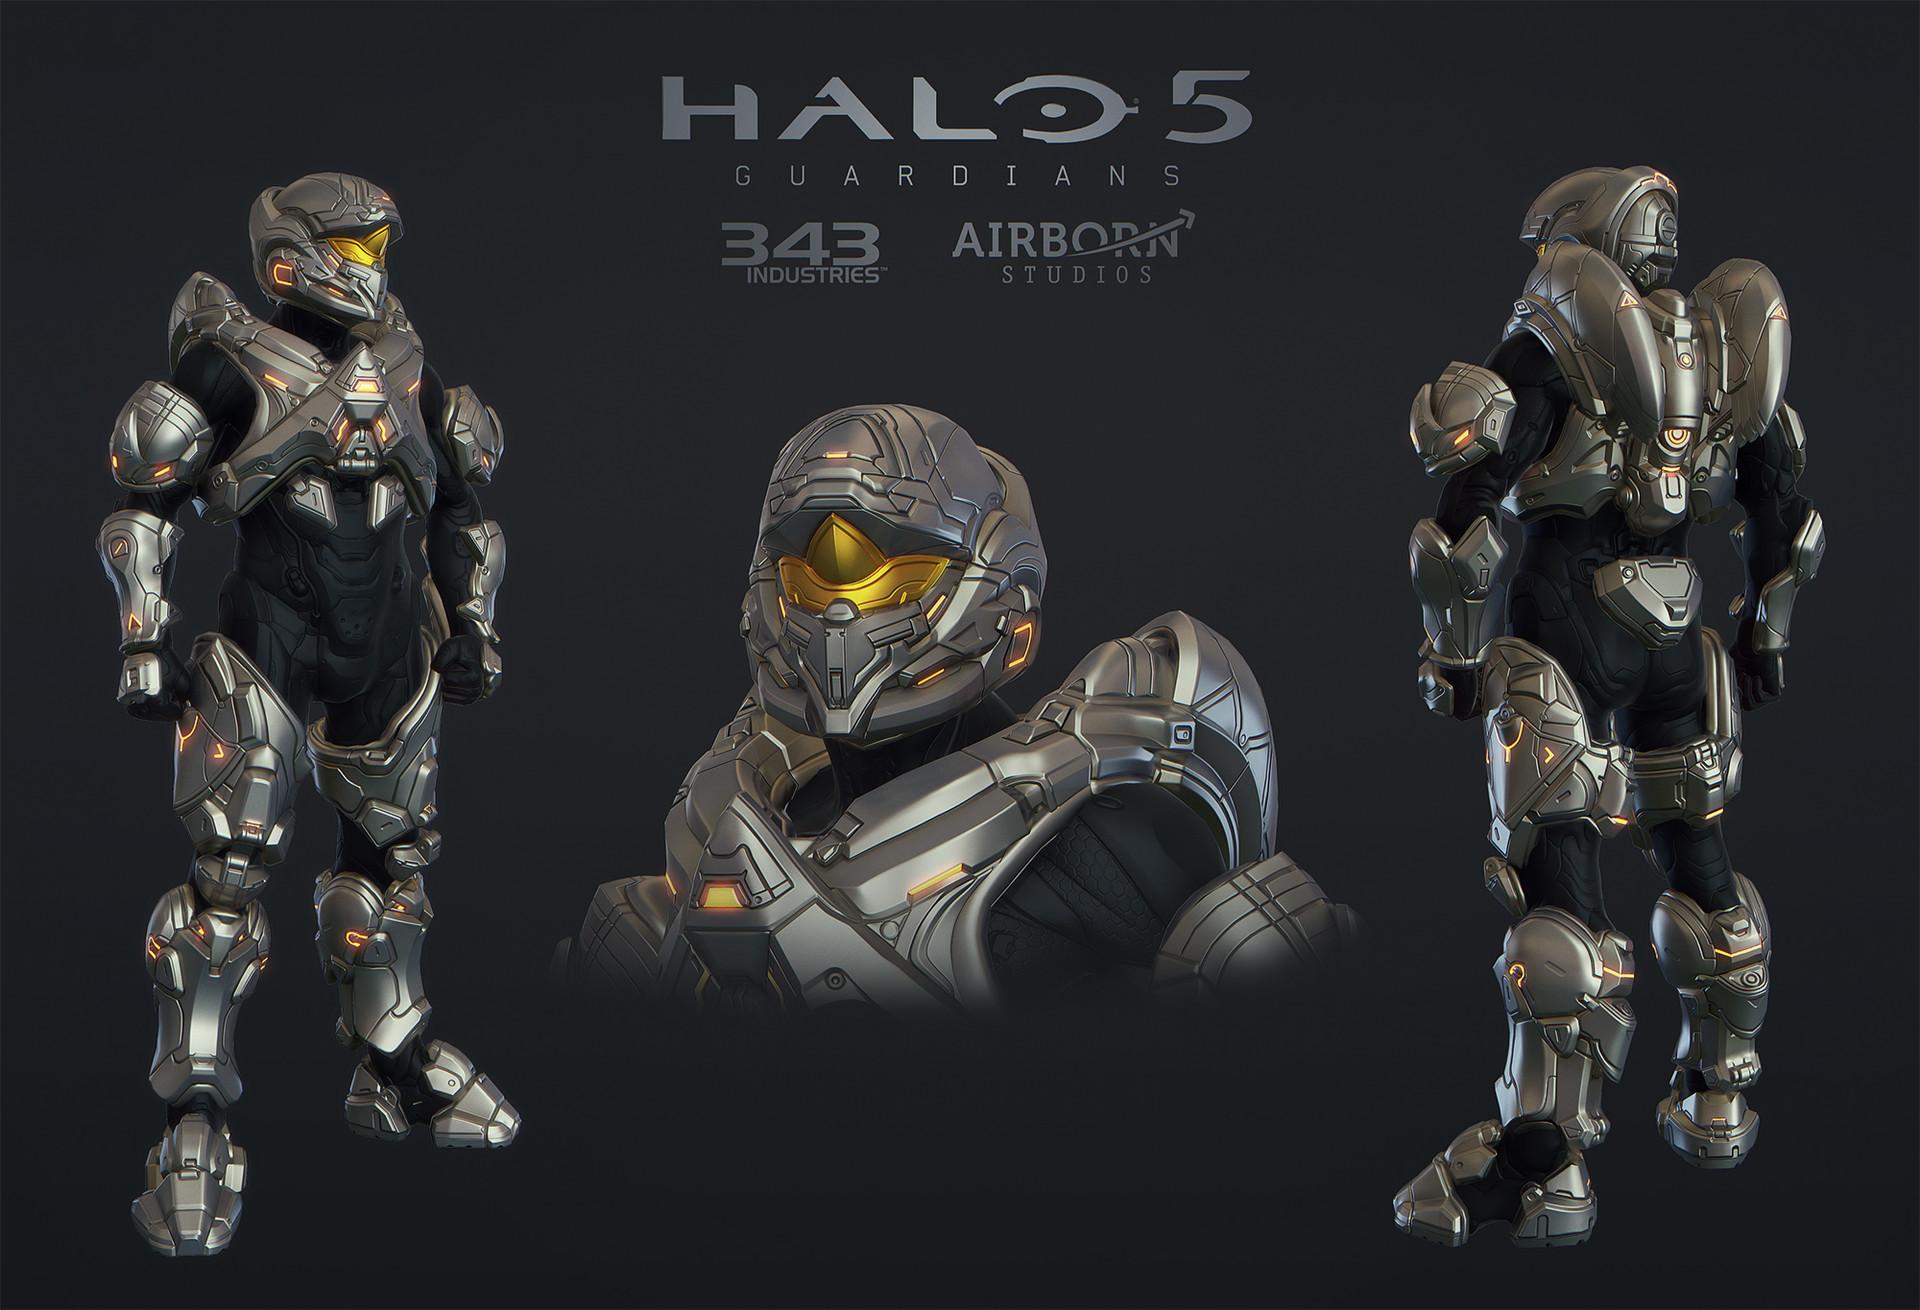 ArtStation - Halo 5 Multiplayer Armor Cinder, Airborn Studios